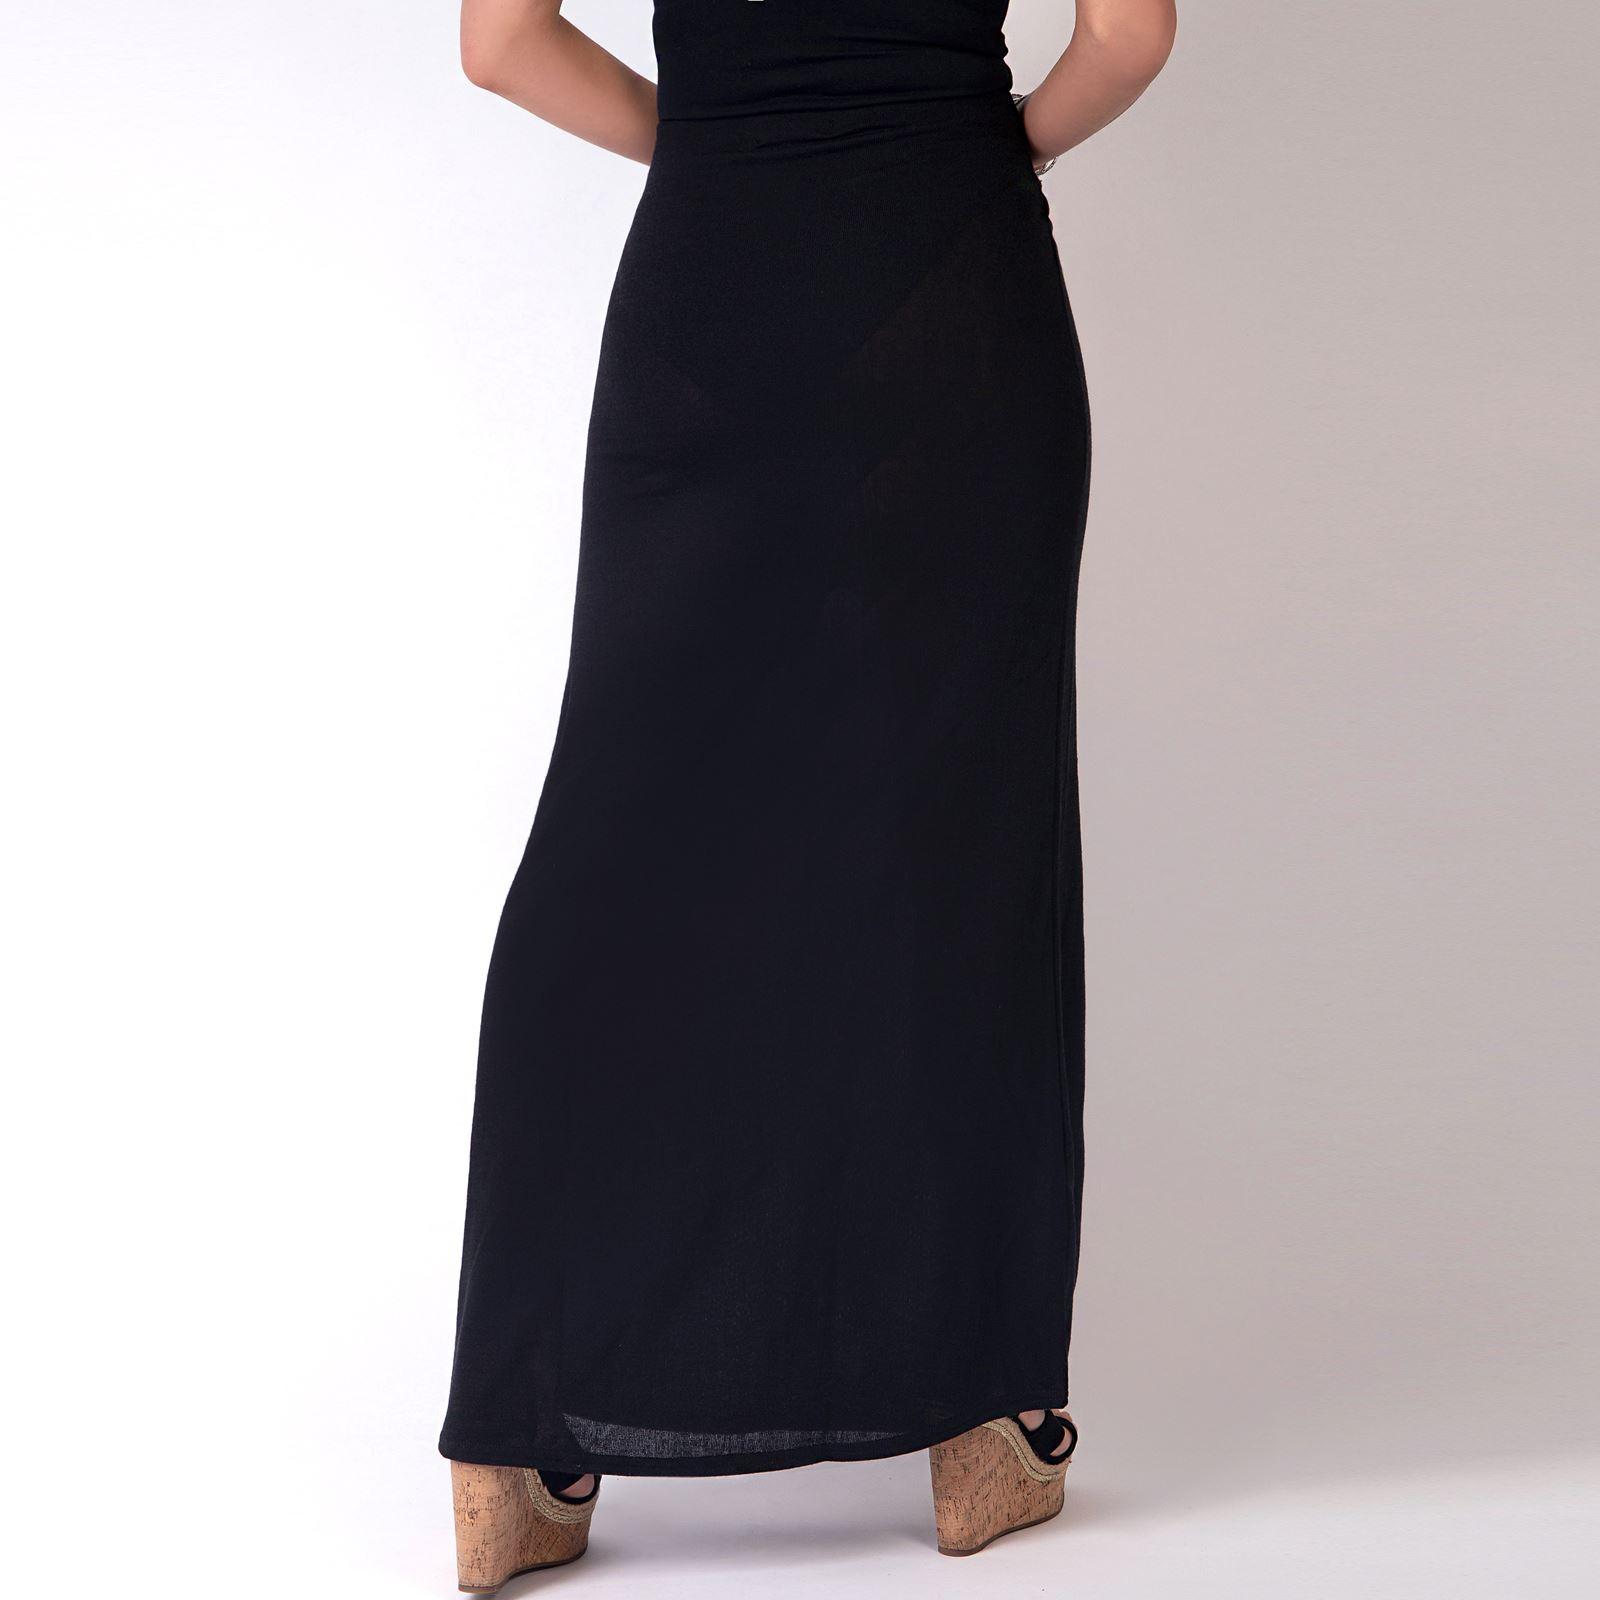 Womens-Ladies-Maxi-Skirt-High-Waist-A-Line-Long-Knit-Stretch-Bodycon-Casual-Boho thumbnail 3